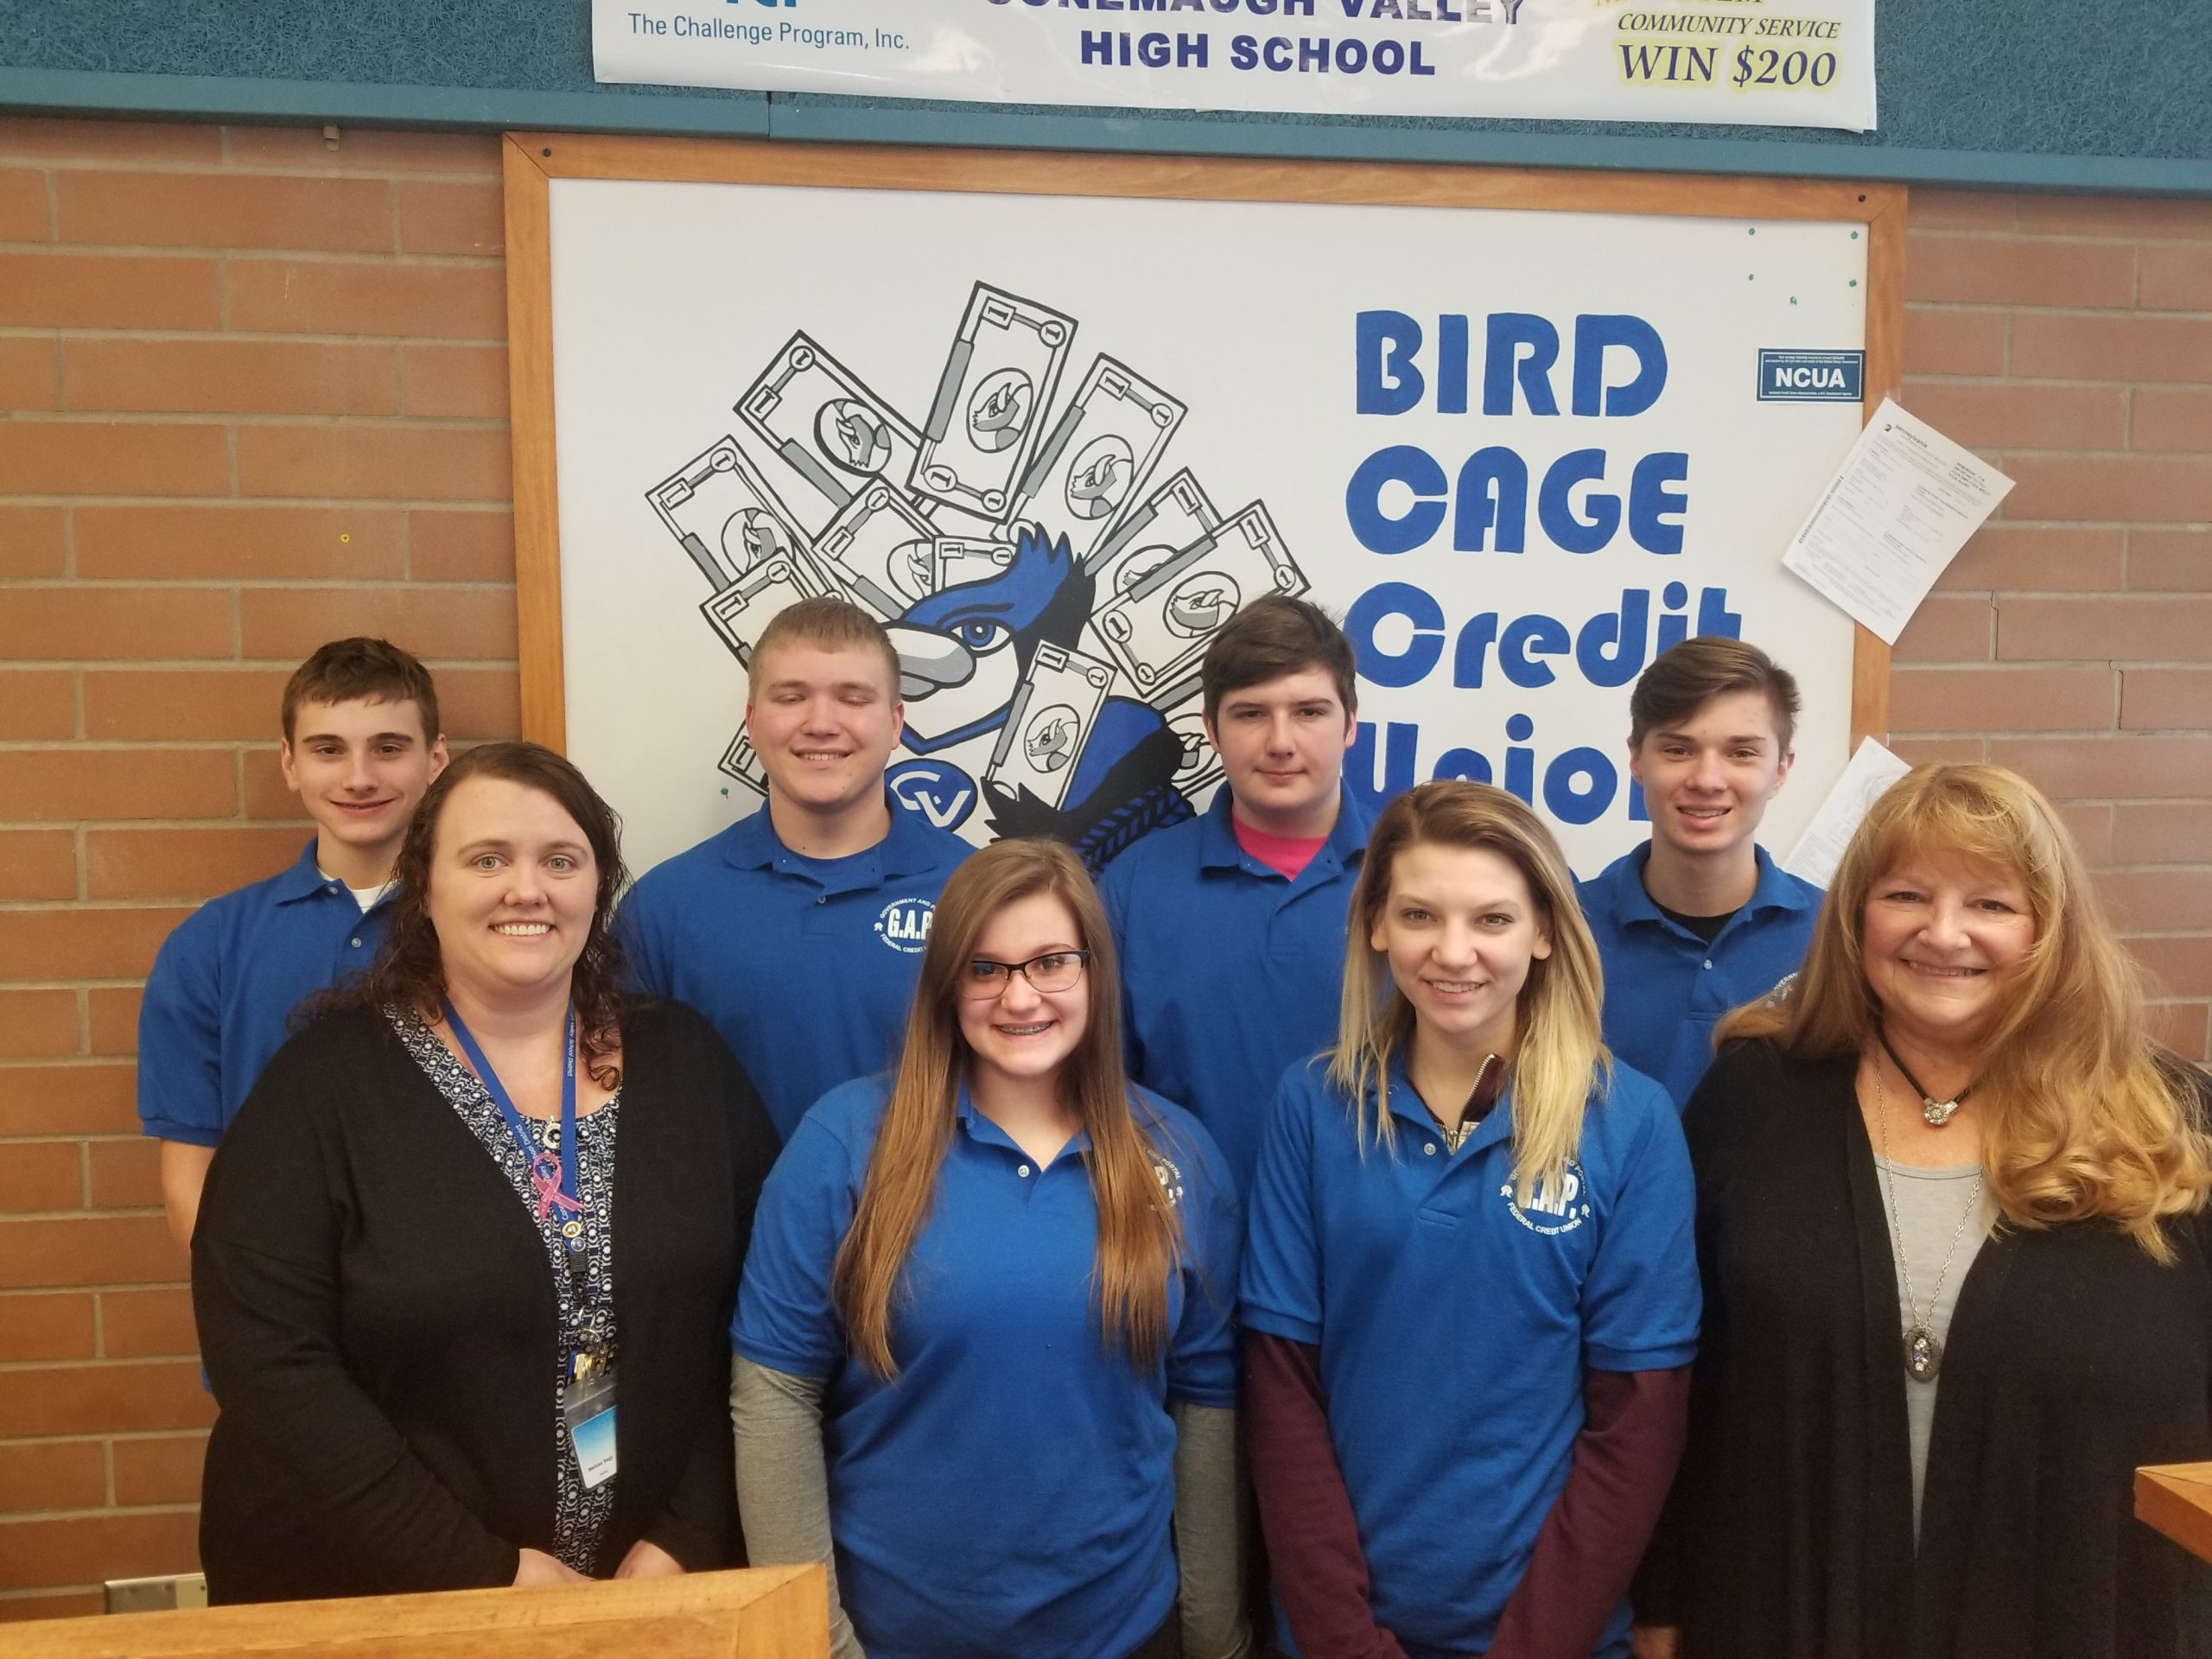 2018 Bird Cage Photo